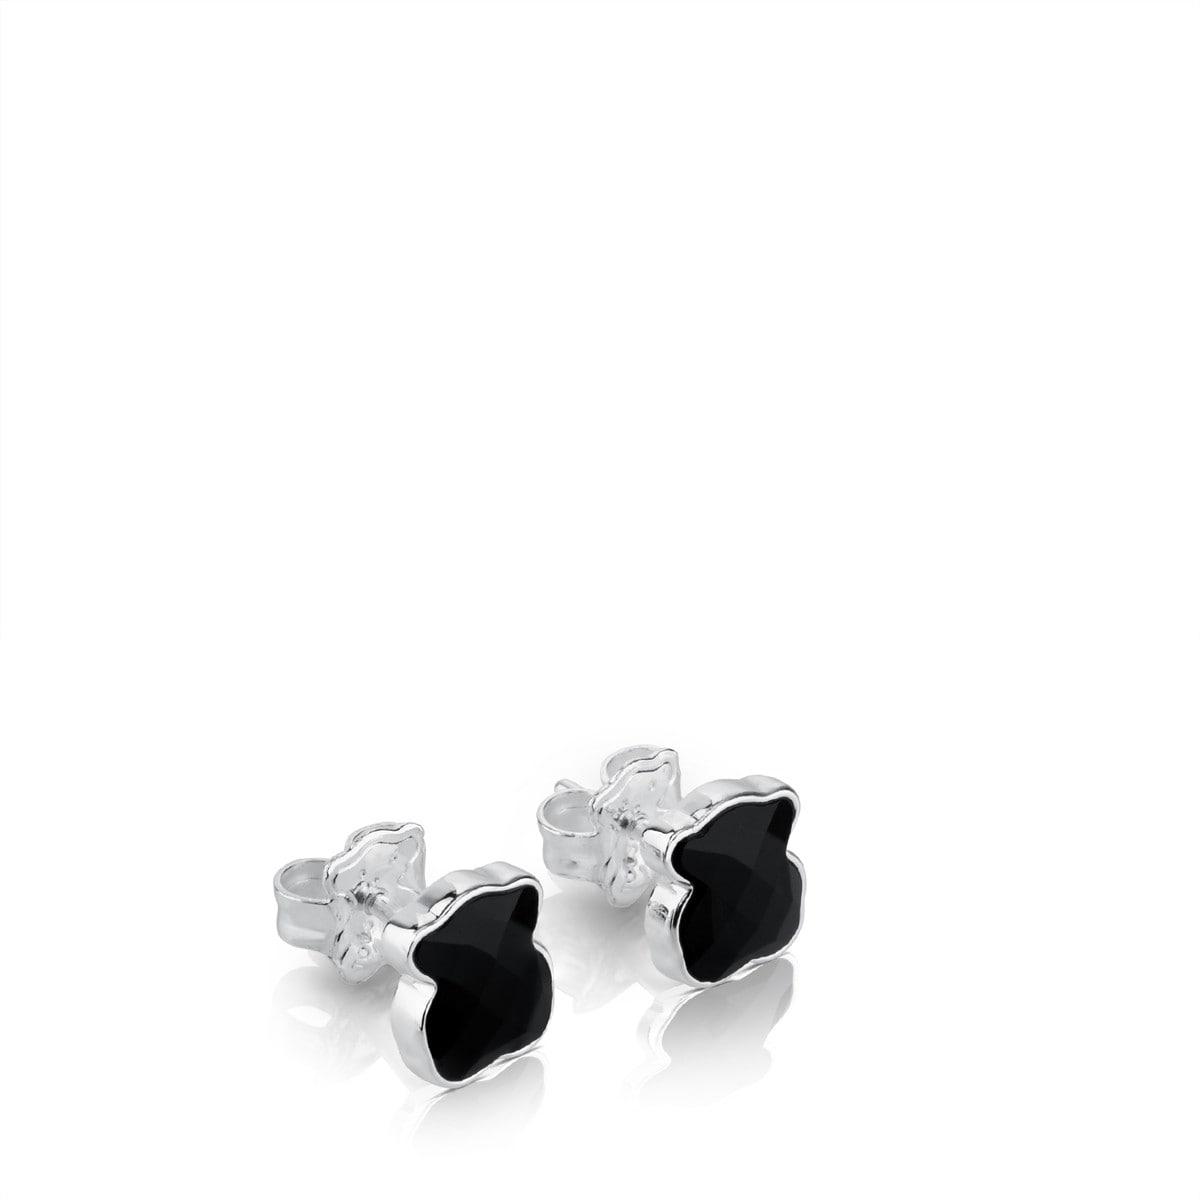 871adbf74ba2 Silver TOUS Color Earrings - Tous Site US